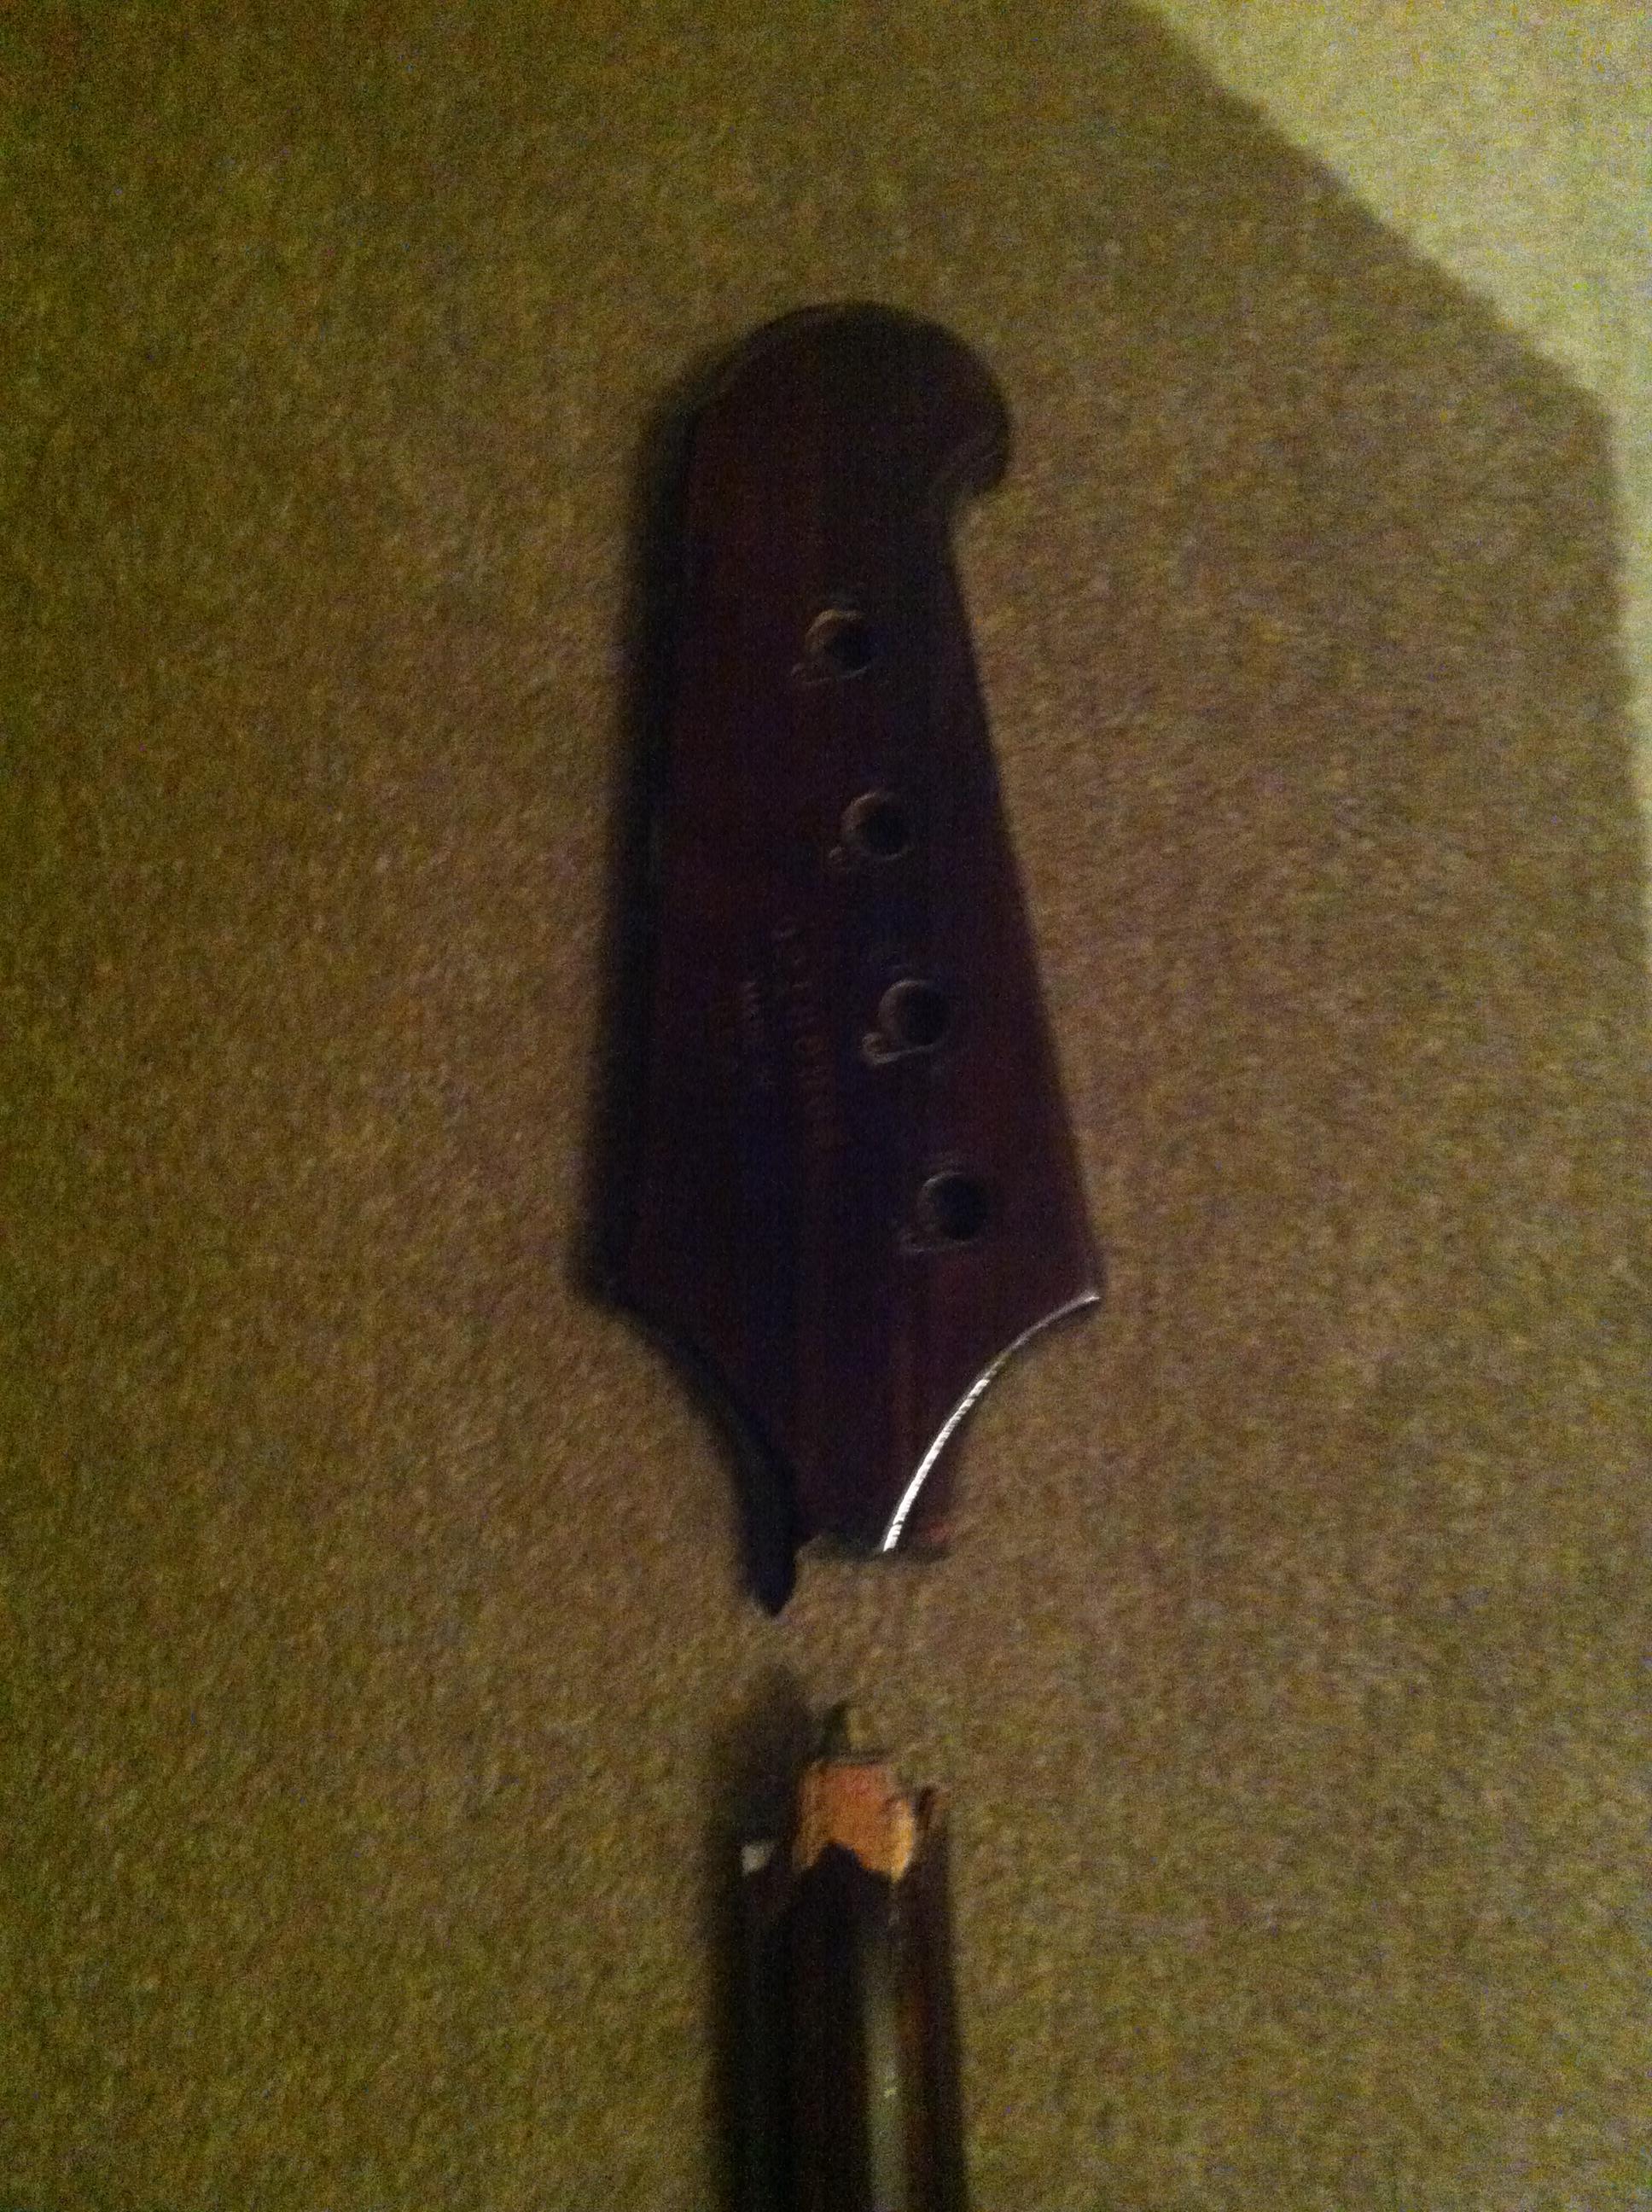 Gibson Thunderbird Bass headstock replacement